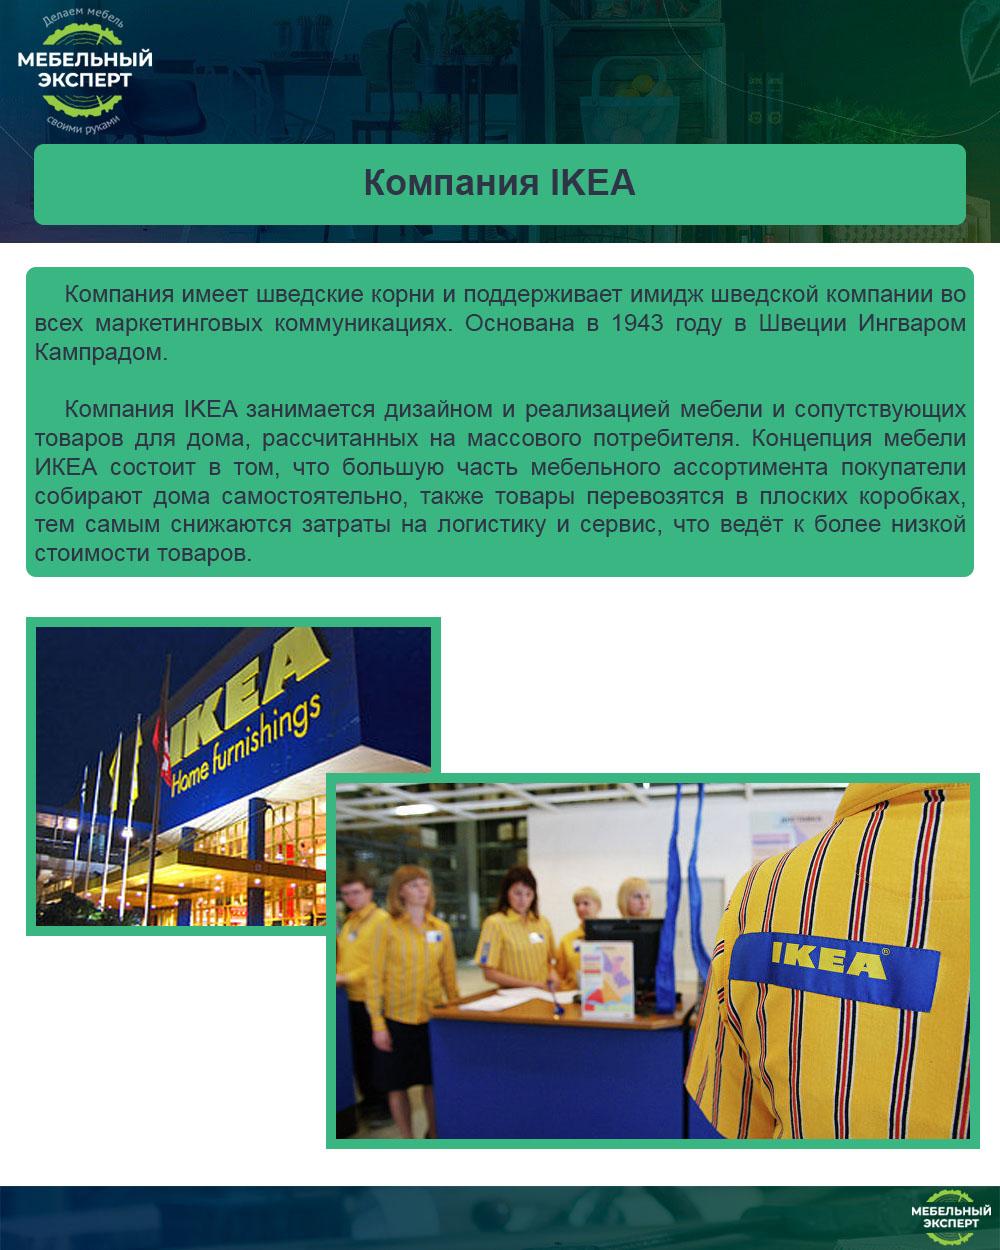 Шкафы икеа: цена и самые последние новинки из каталога ikea (150 фото)